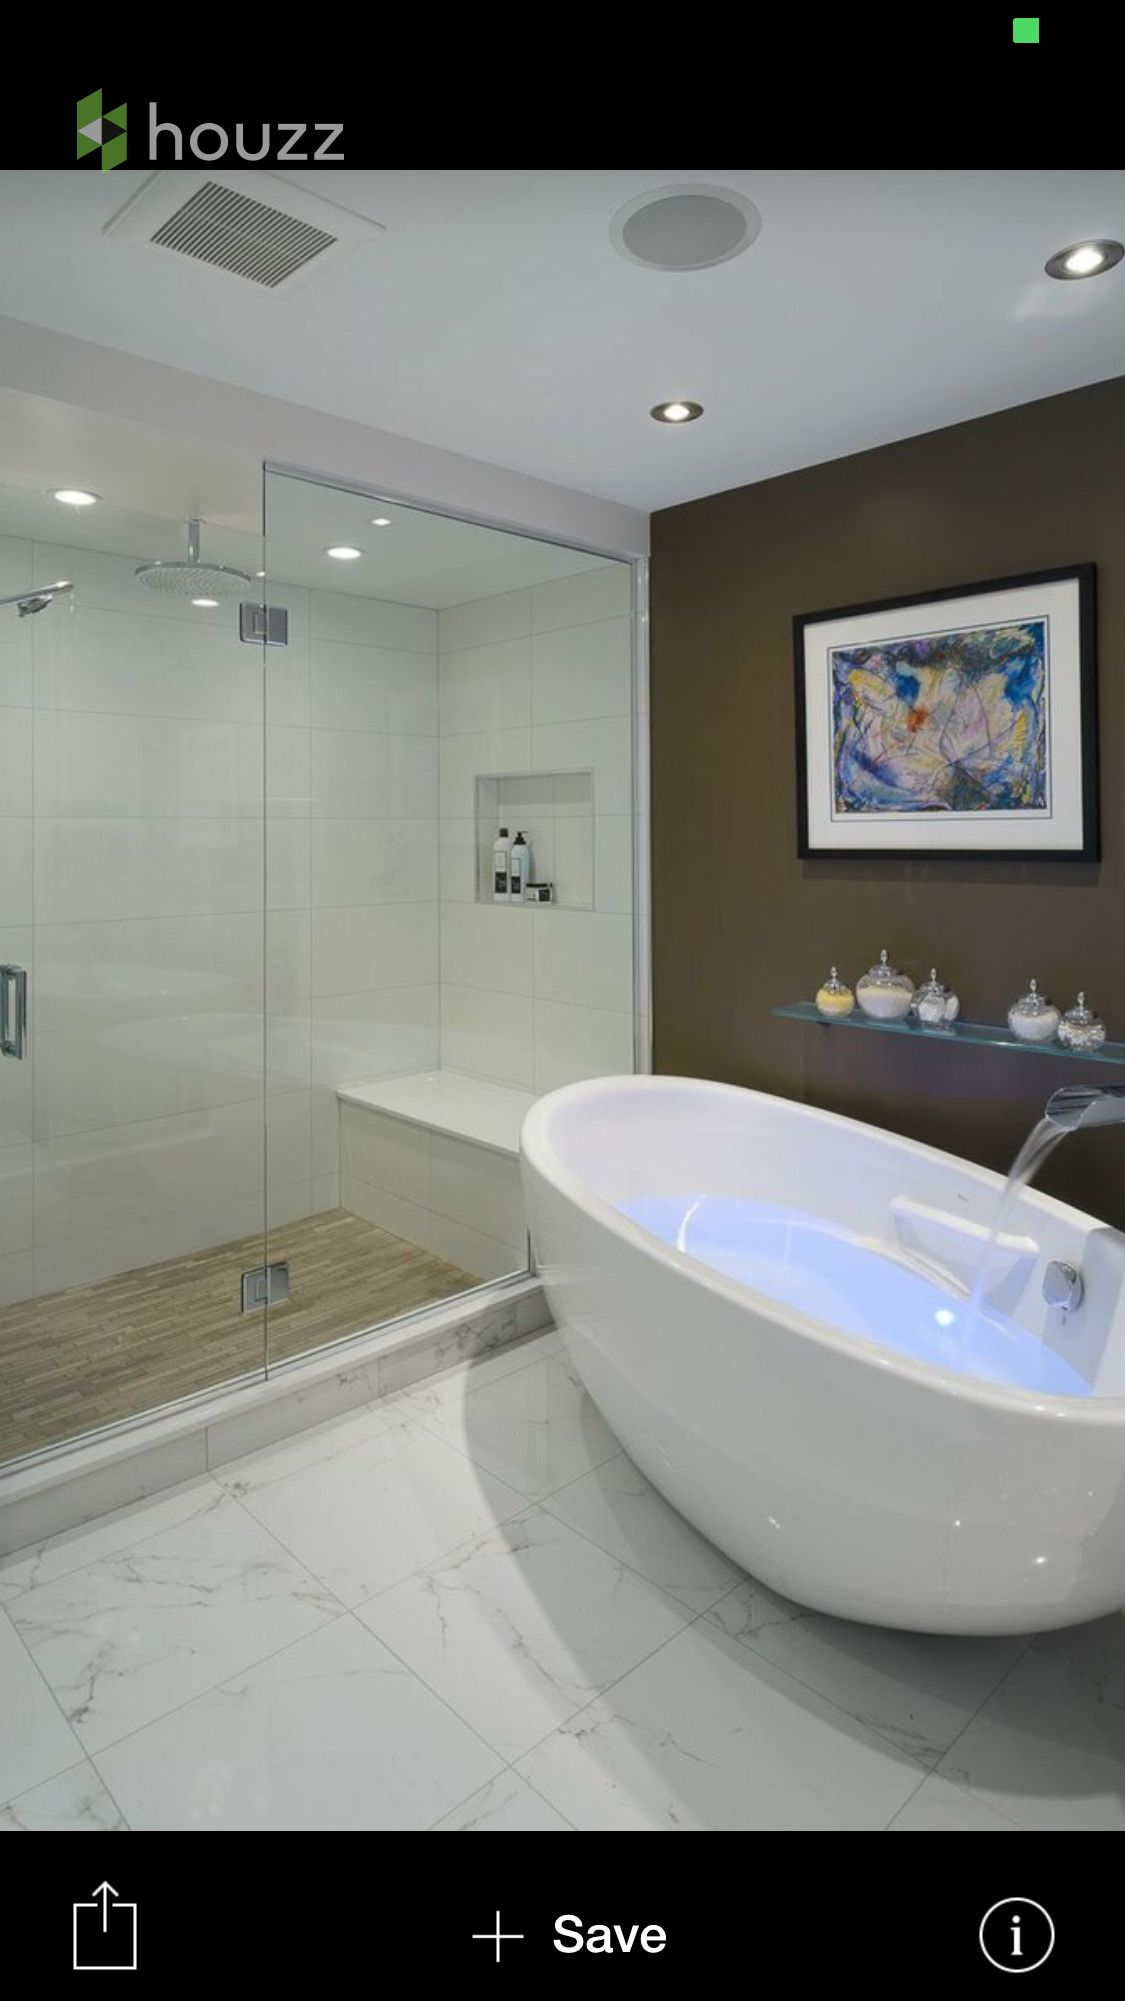 Love the bathtub | Bathrooms my style | Pinterest | Bathtubs